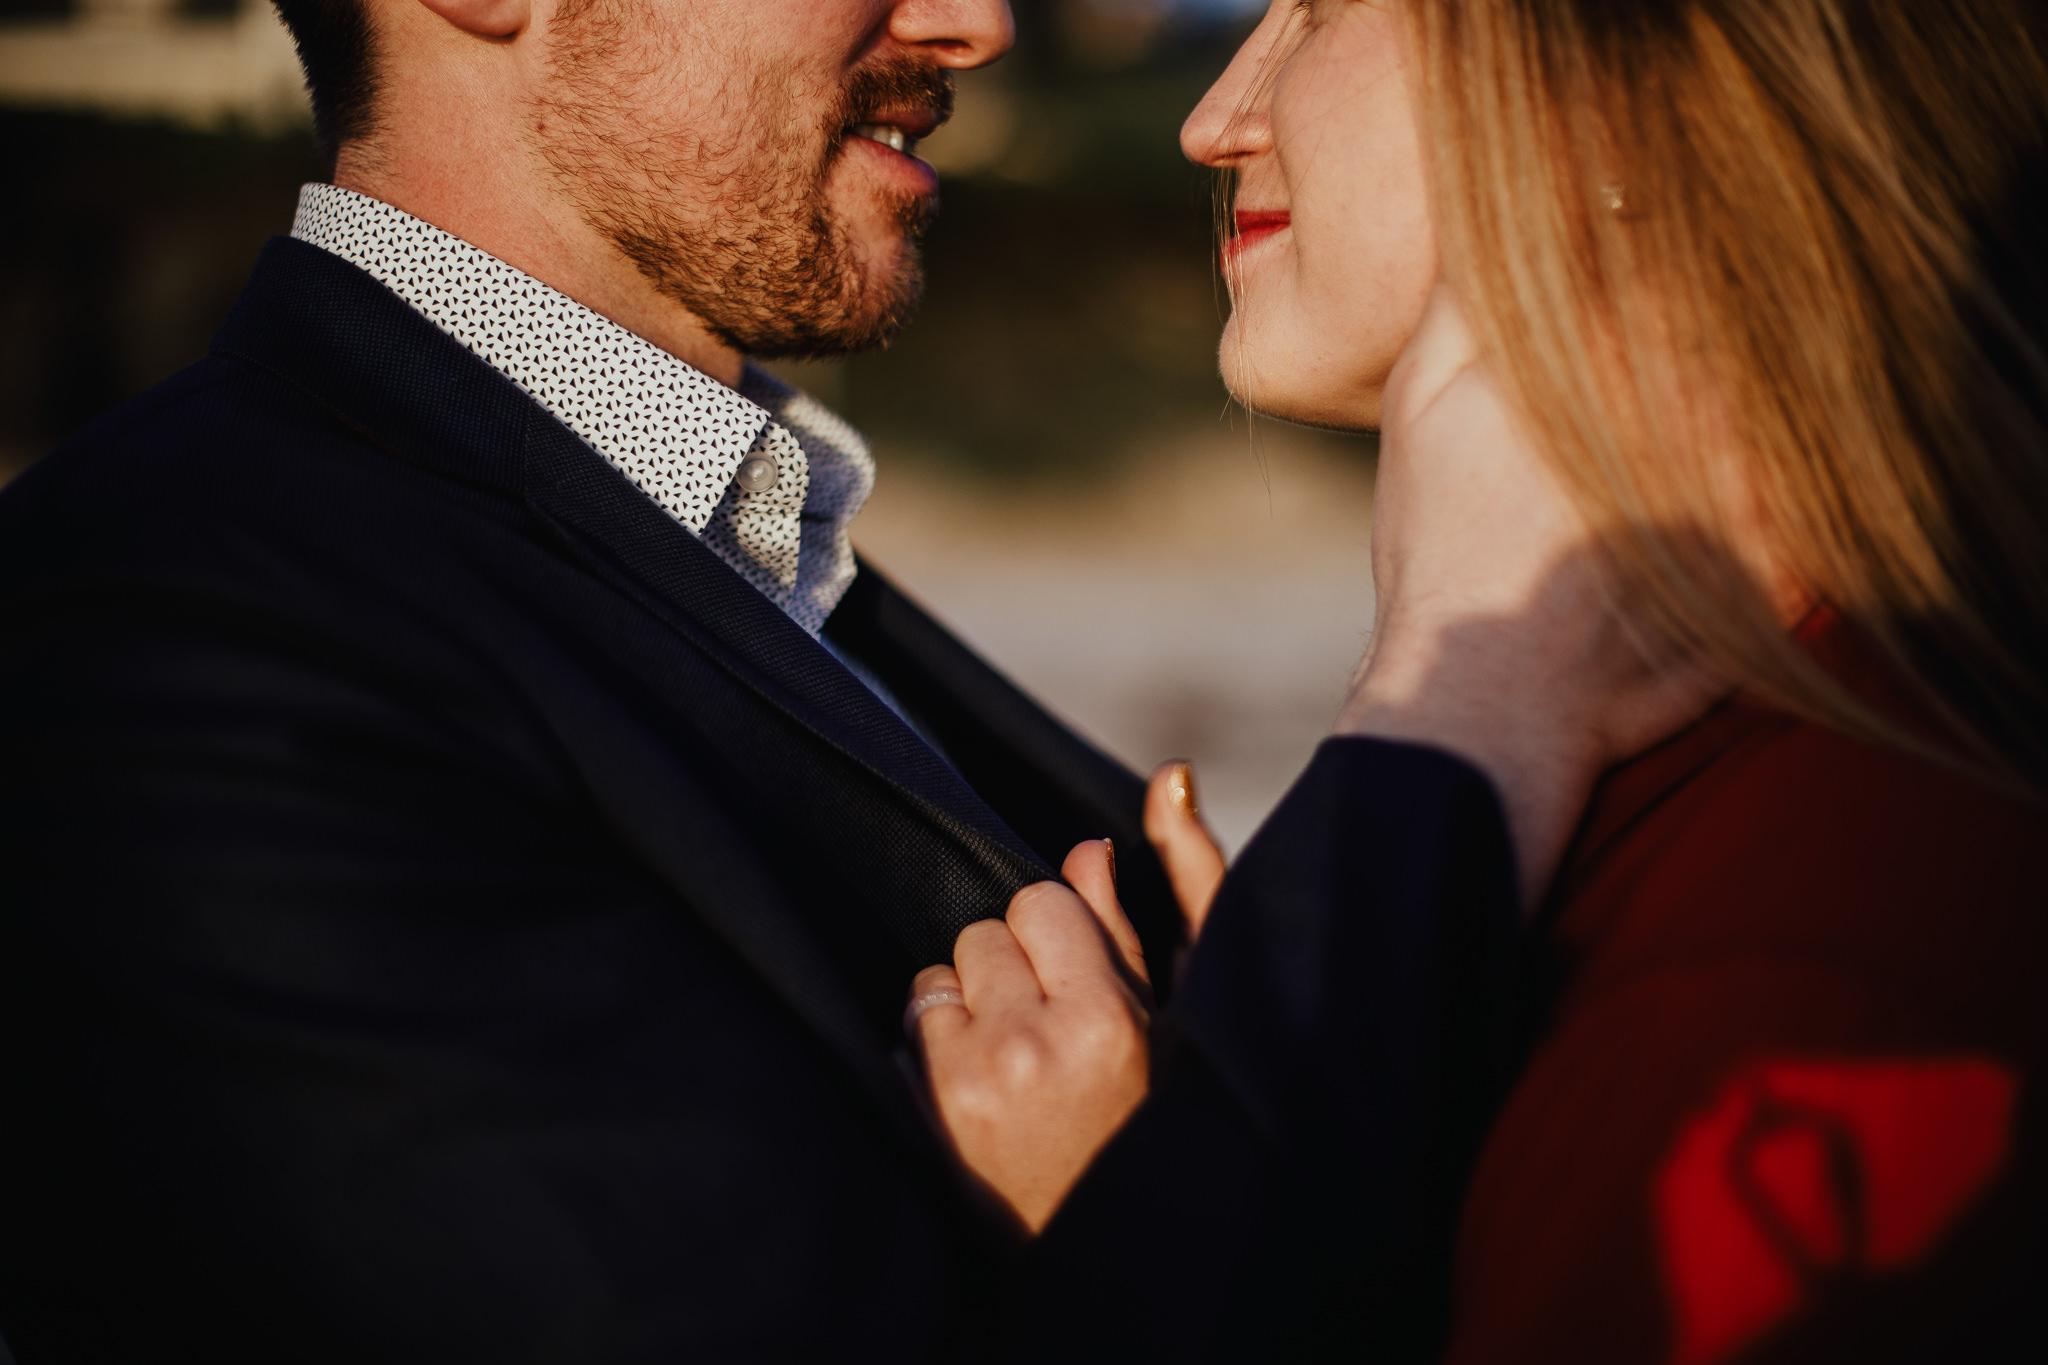 Archer Inspired Photography Carmel Beach California Wedding Engagement Lifestyle Anniversary Natural Light Photographer-31.jpg